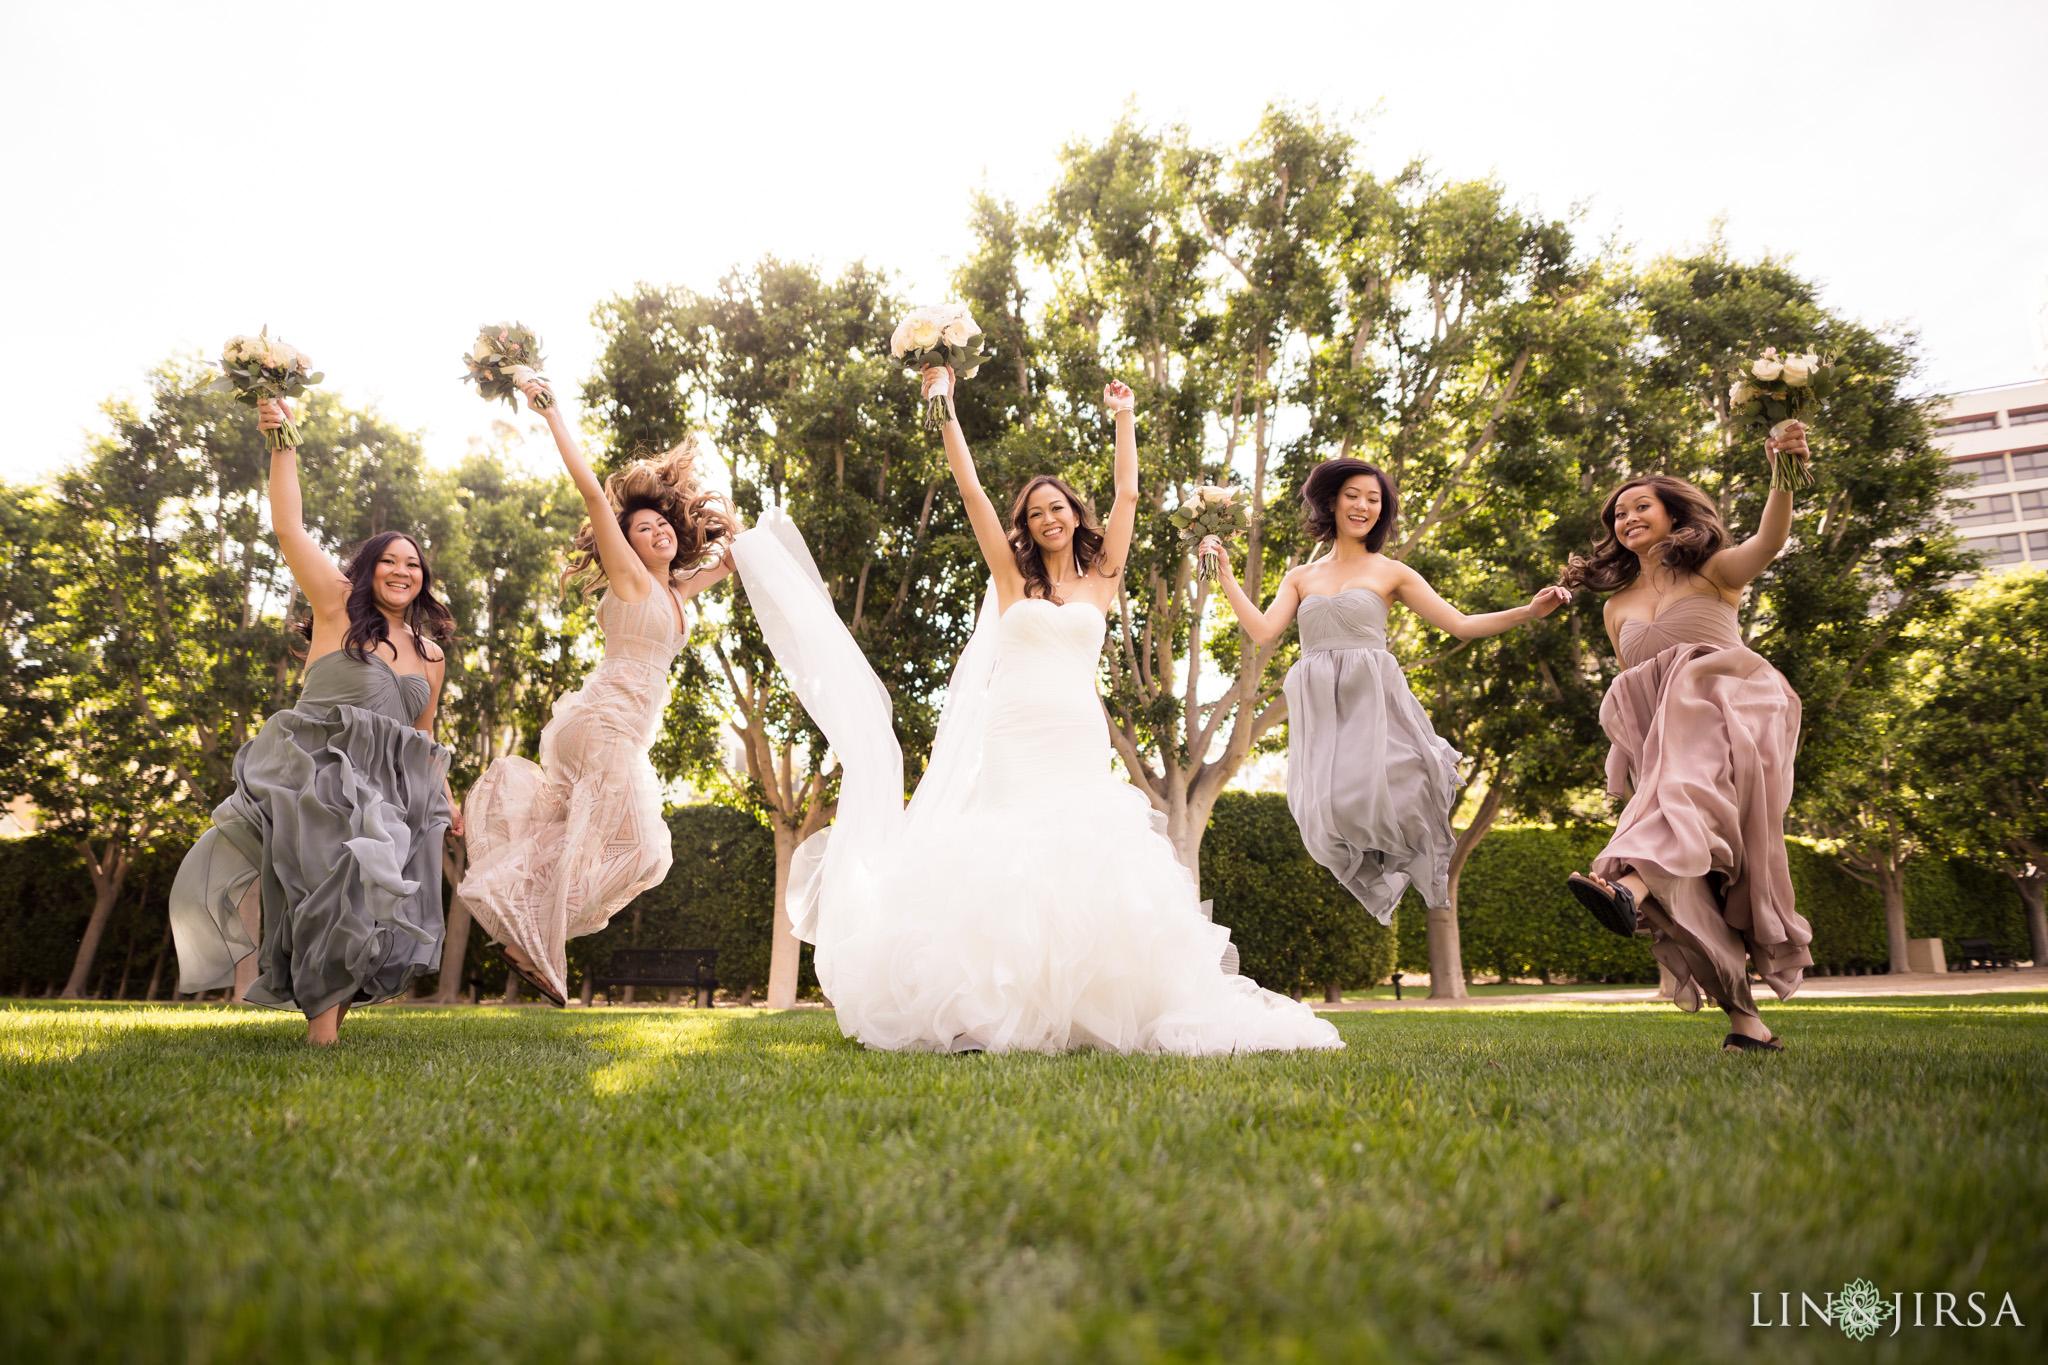 05 hotel irvine orange county bridesmaids wedding photography